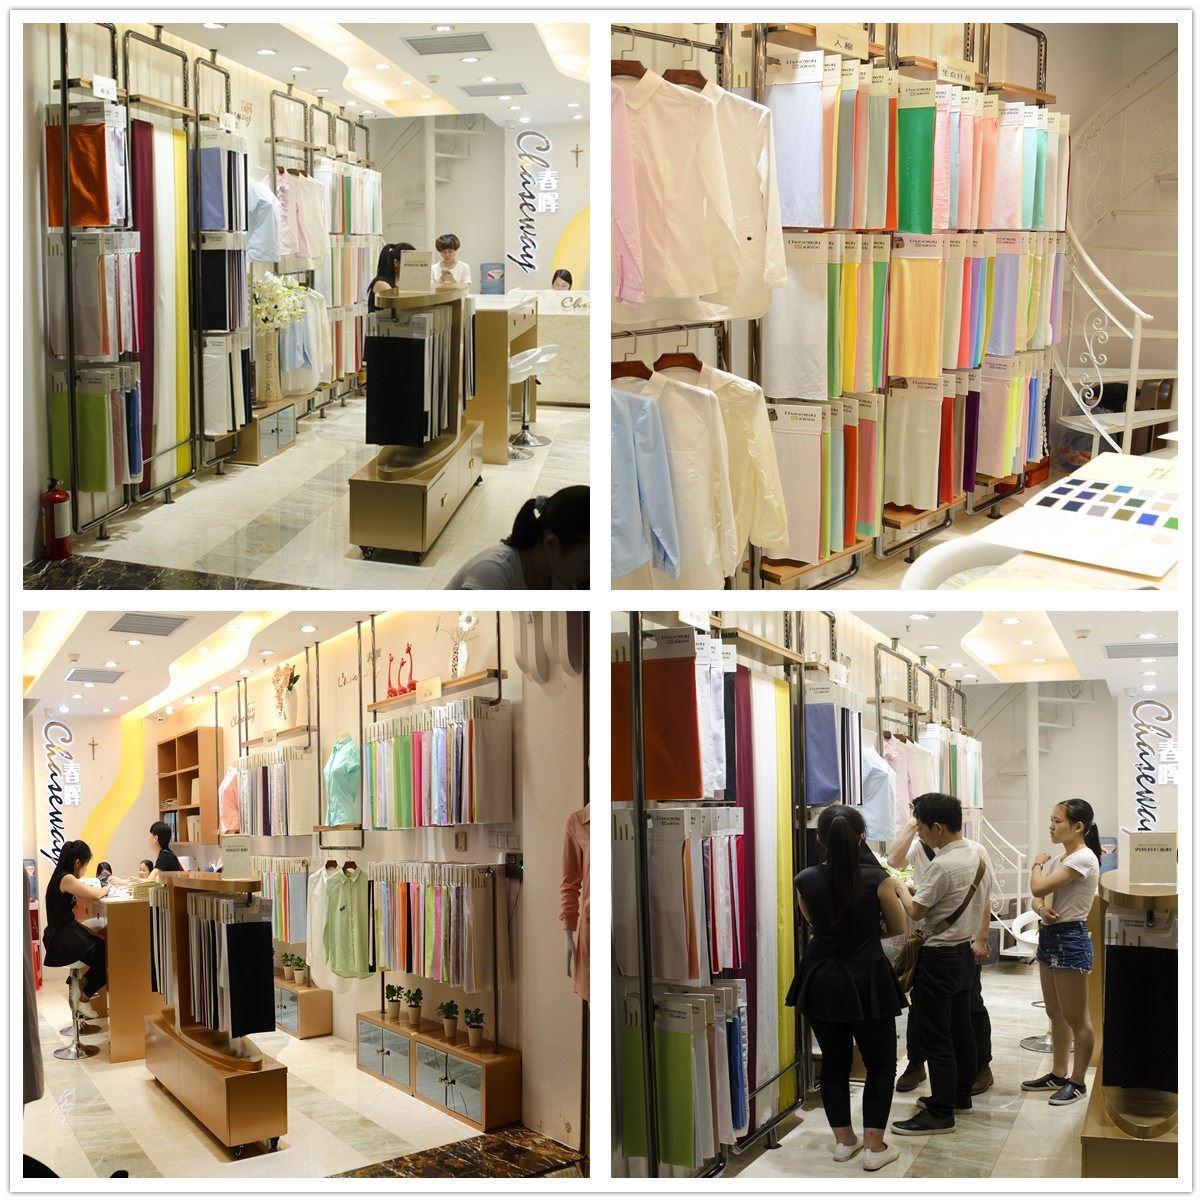 Hot Seller 100% Cotton Poplin Woven Fabric for Shirt